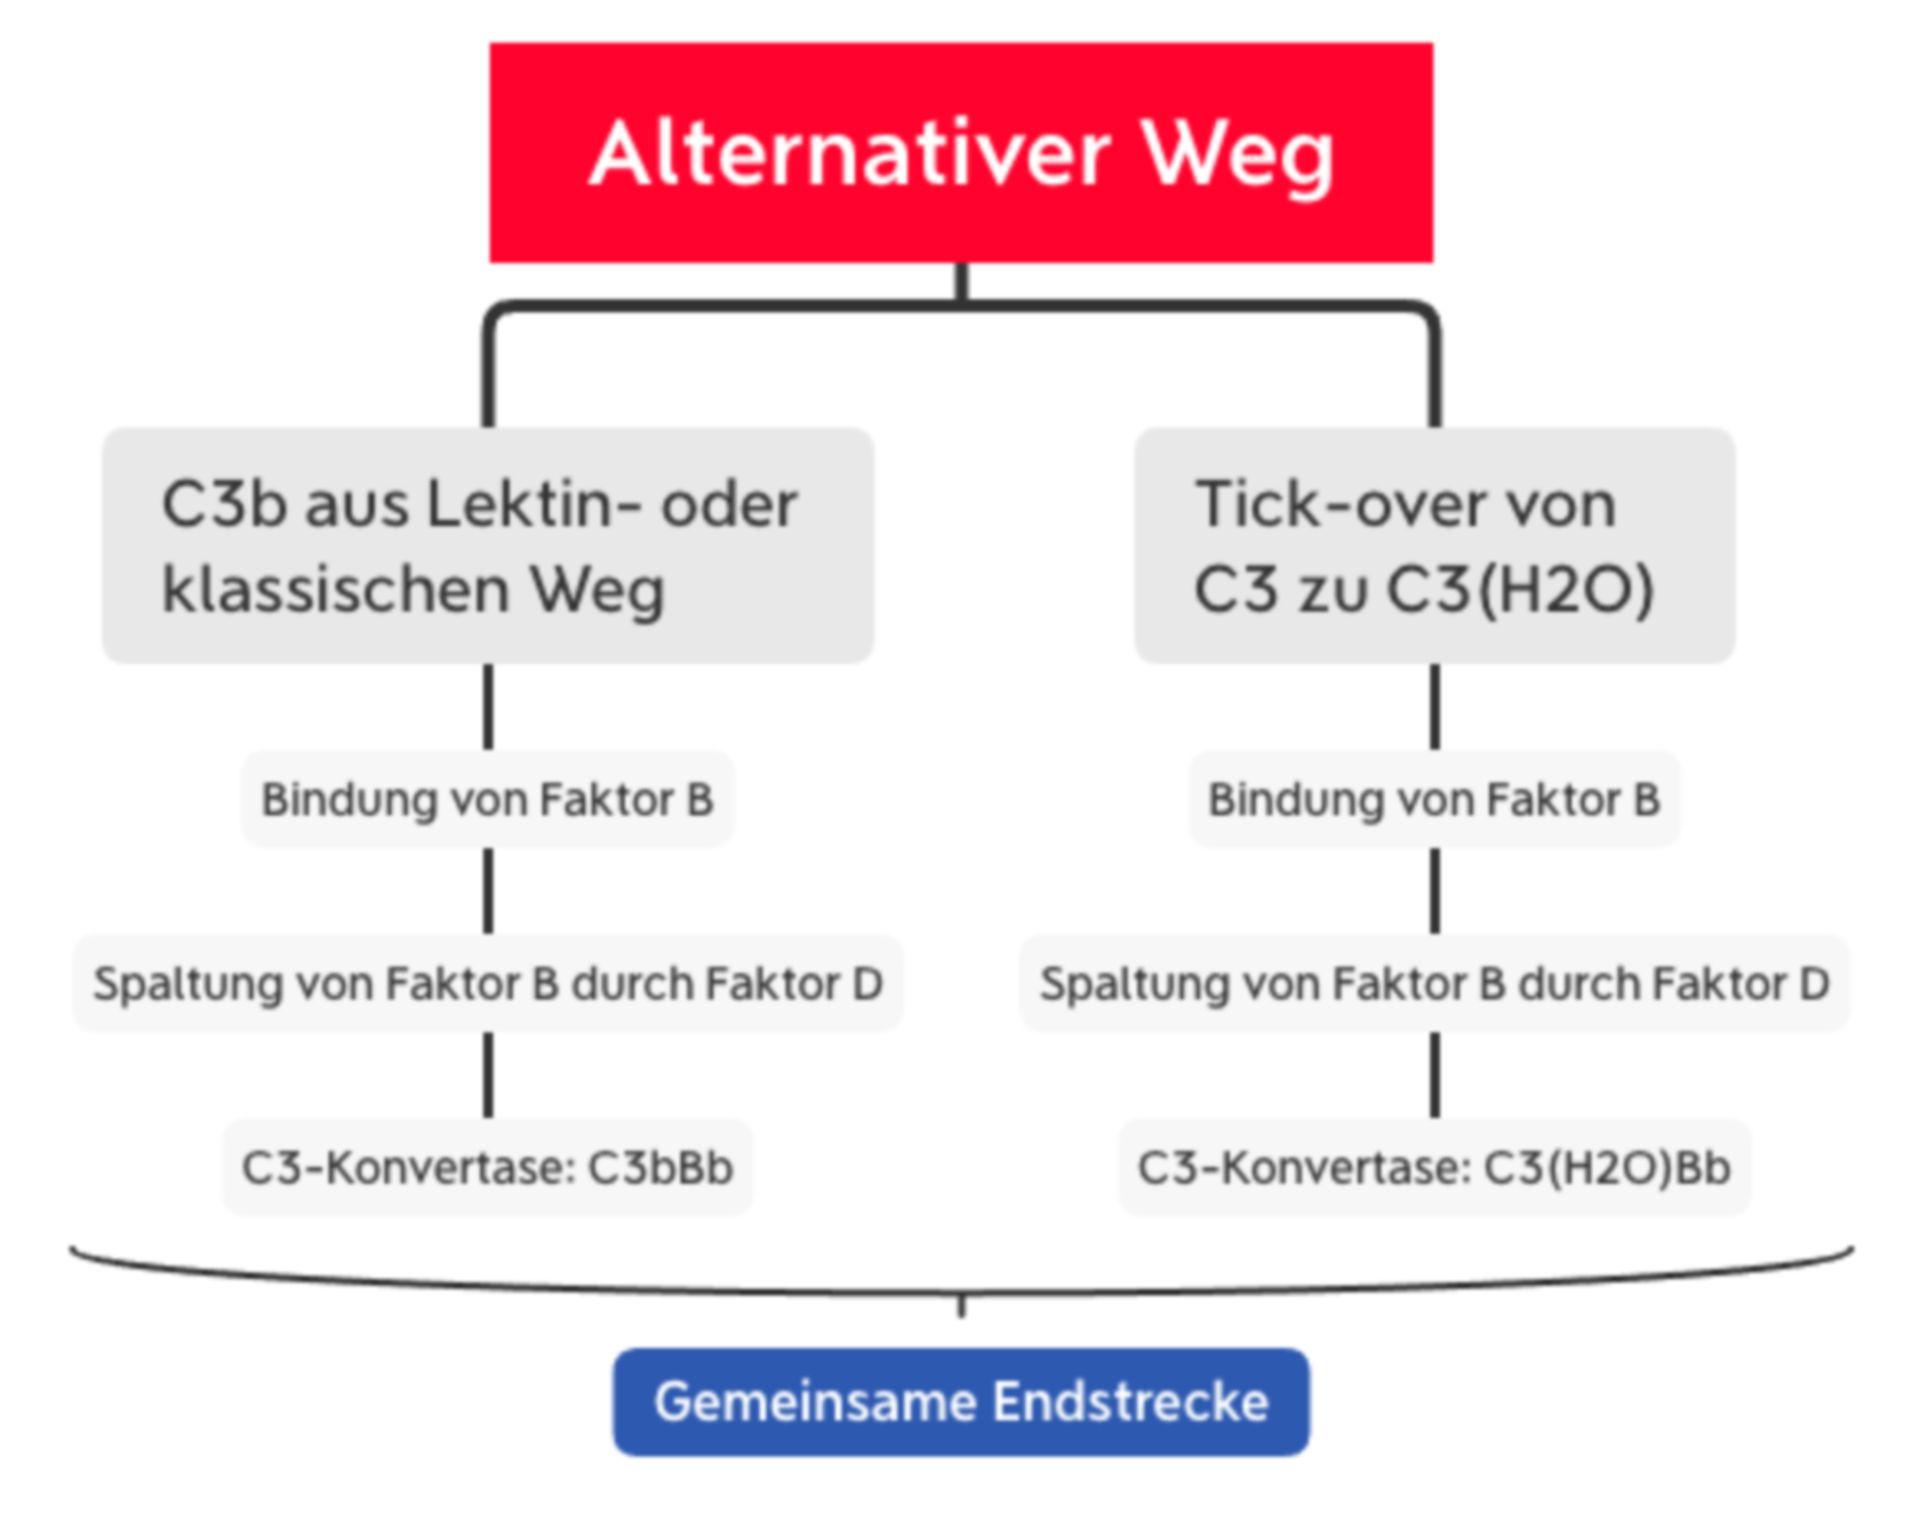 Komplementsystem: Alternativer Weg